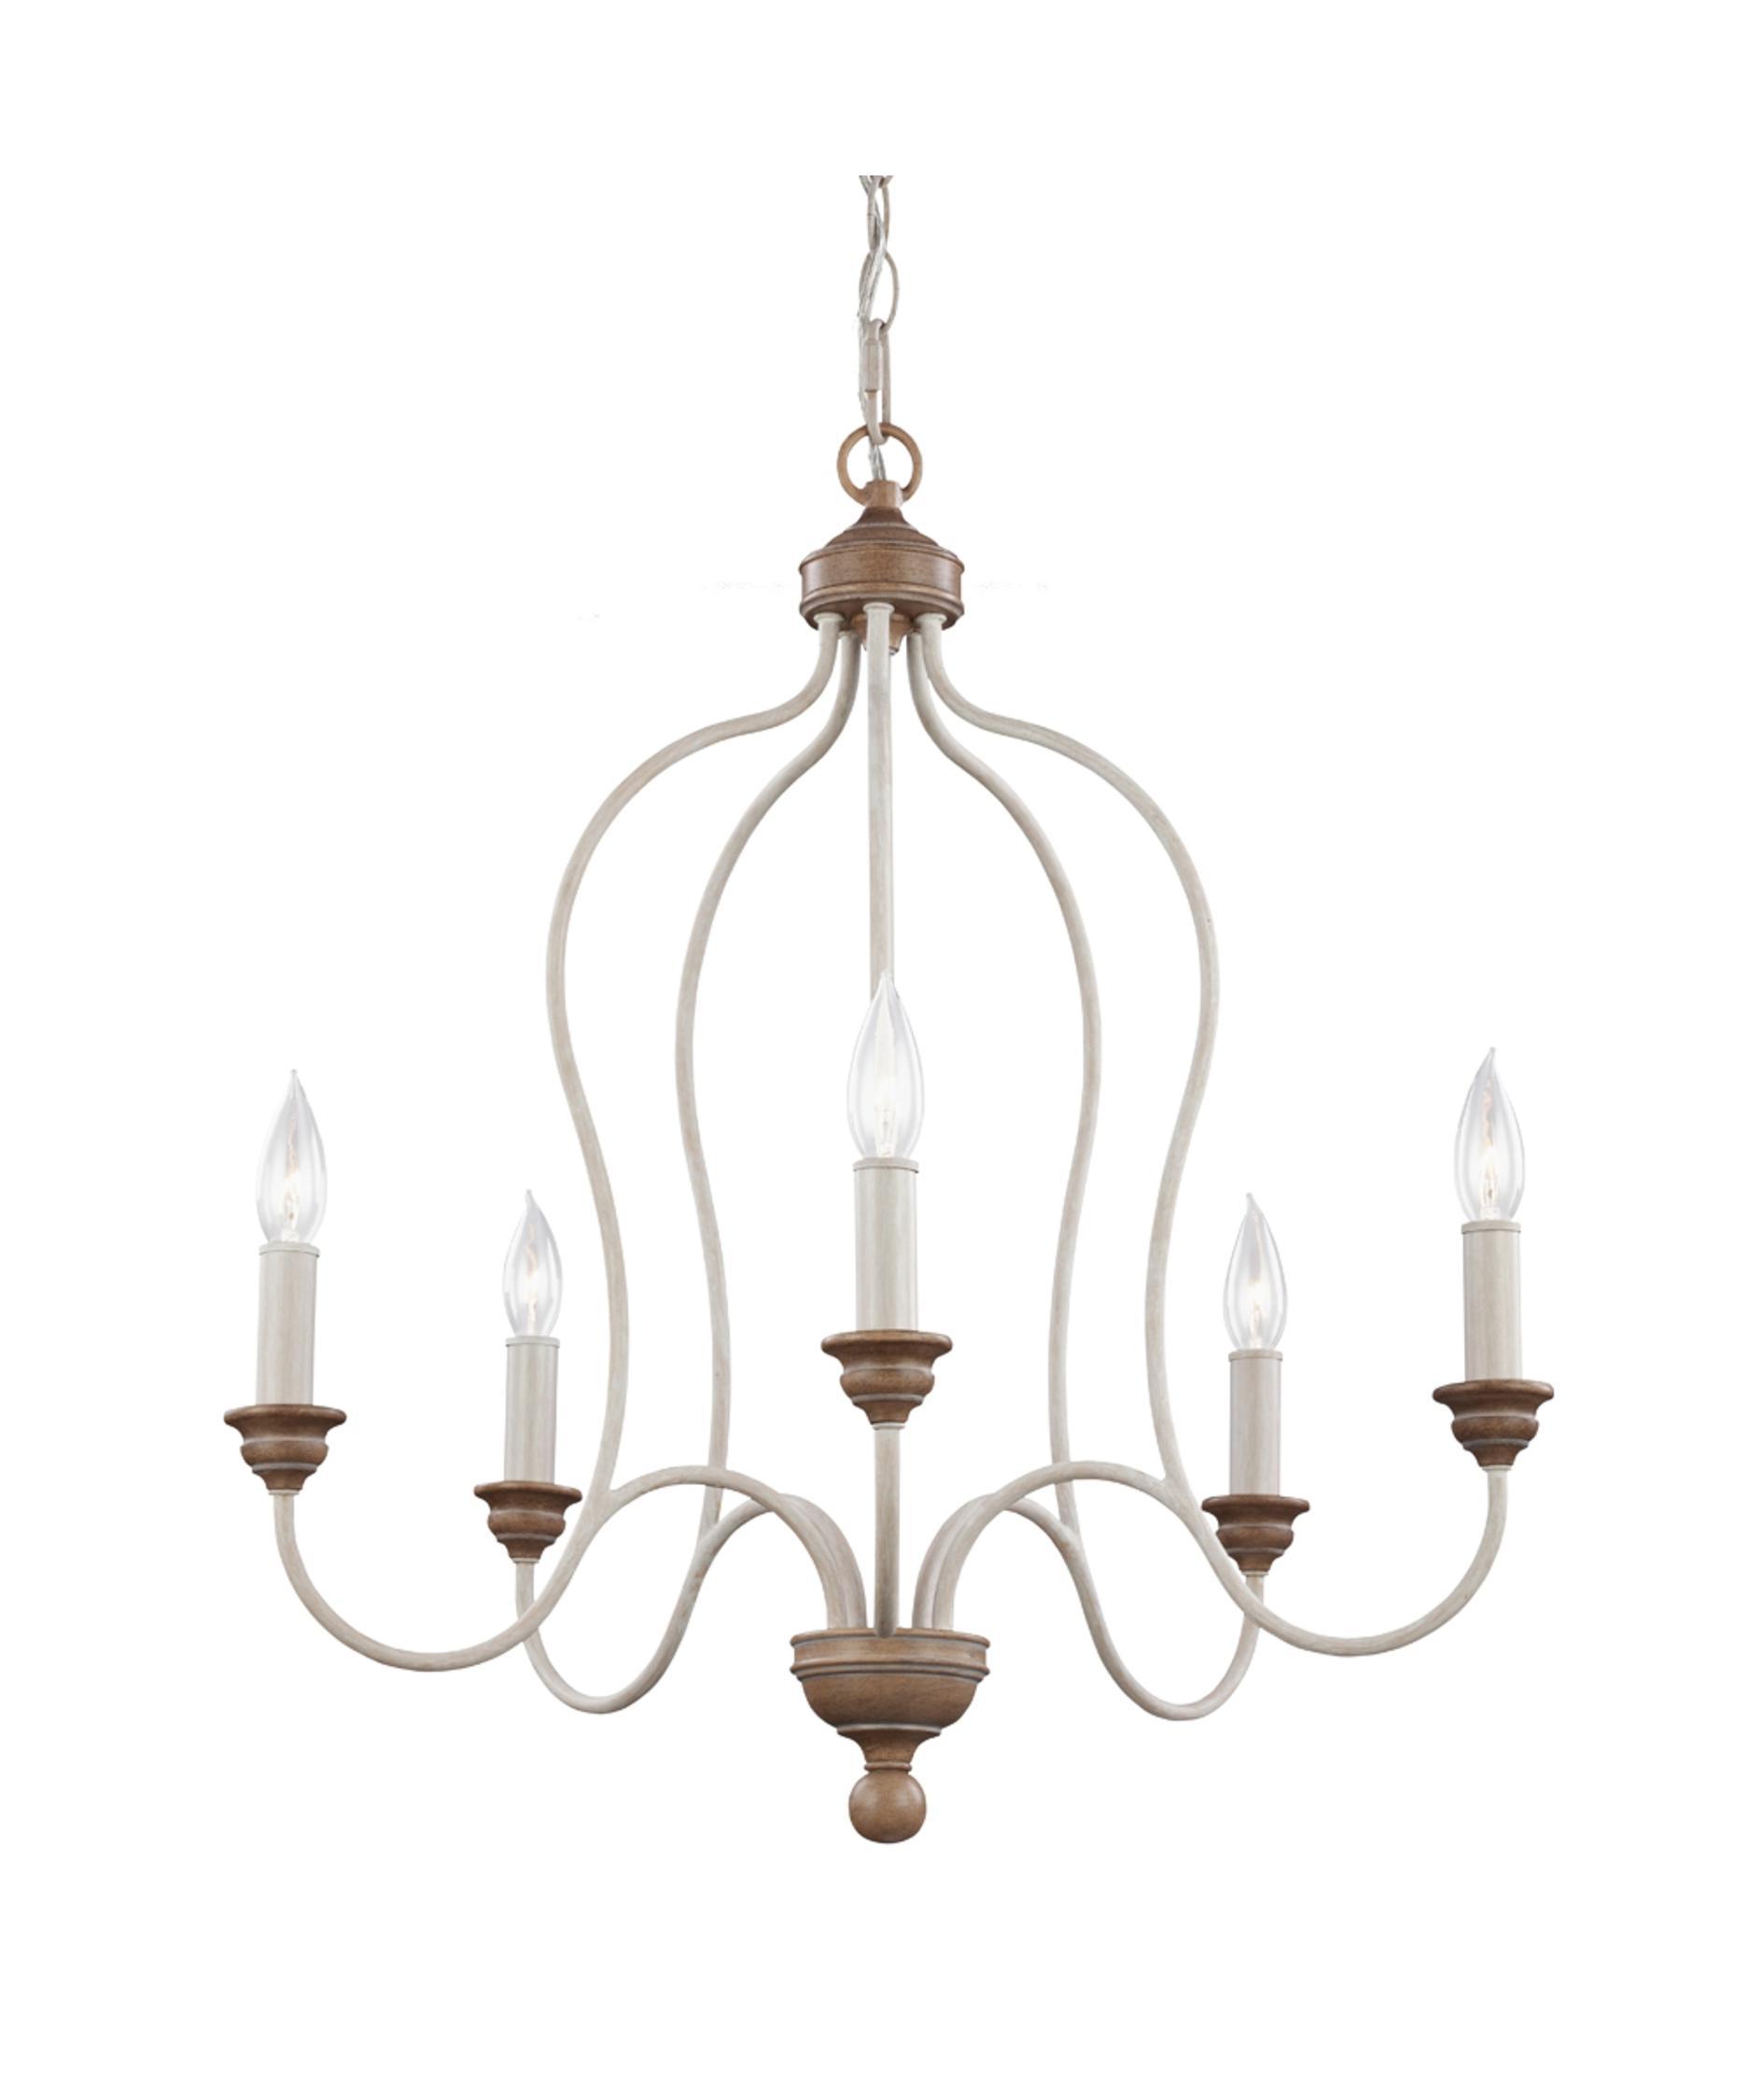 Murray Feiss Discount Lighting | Murray Feiss | Murray Feiss Bathroom Lighting